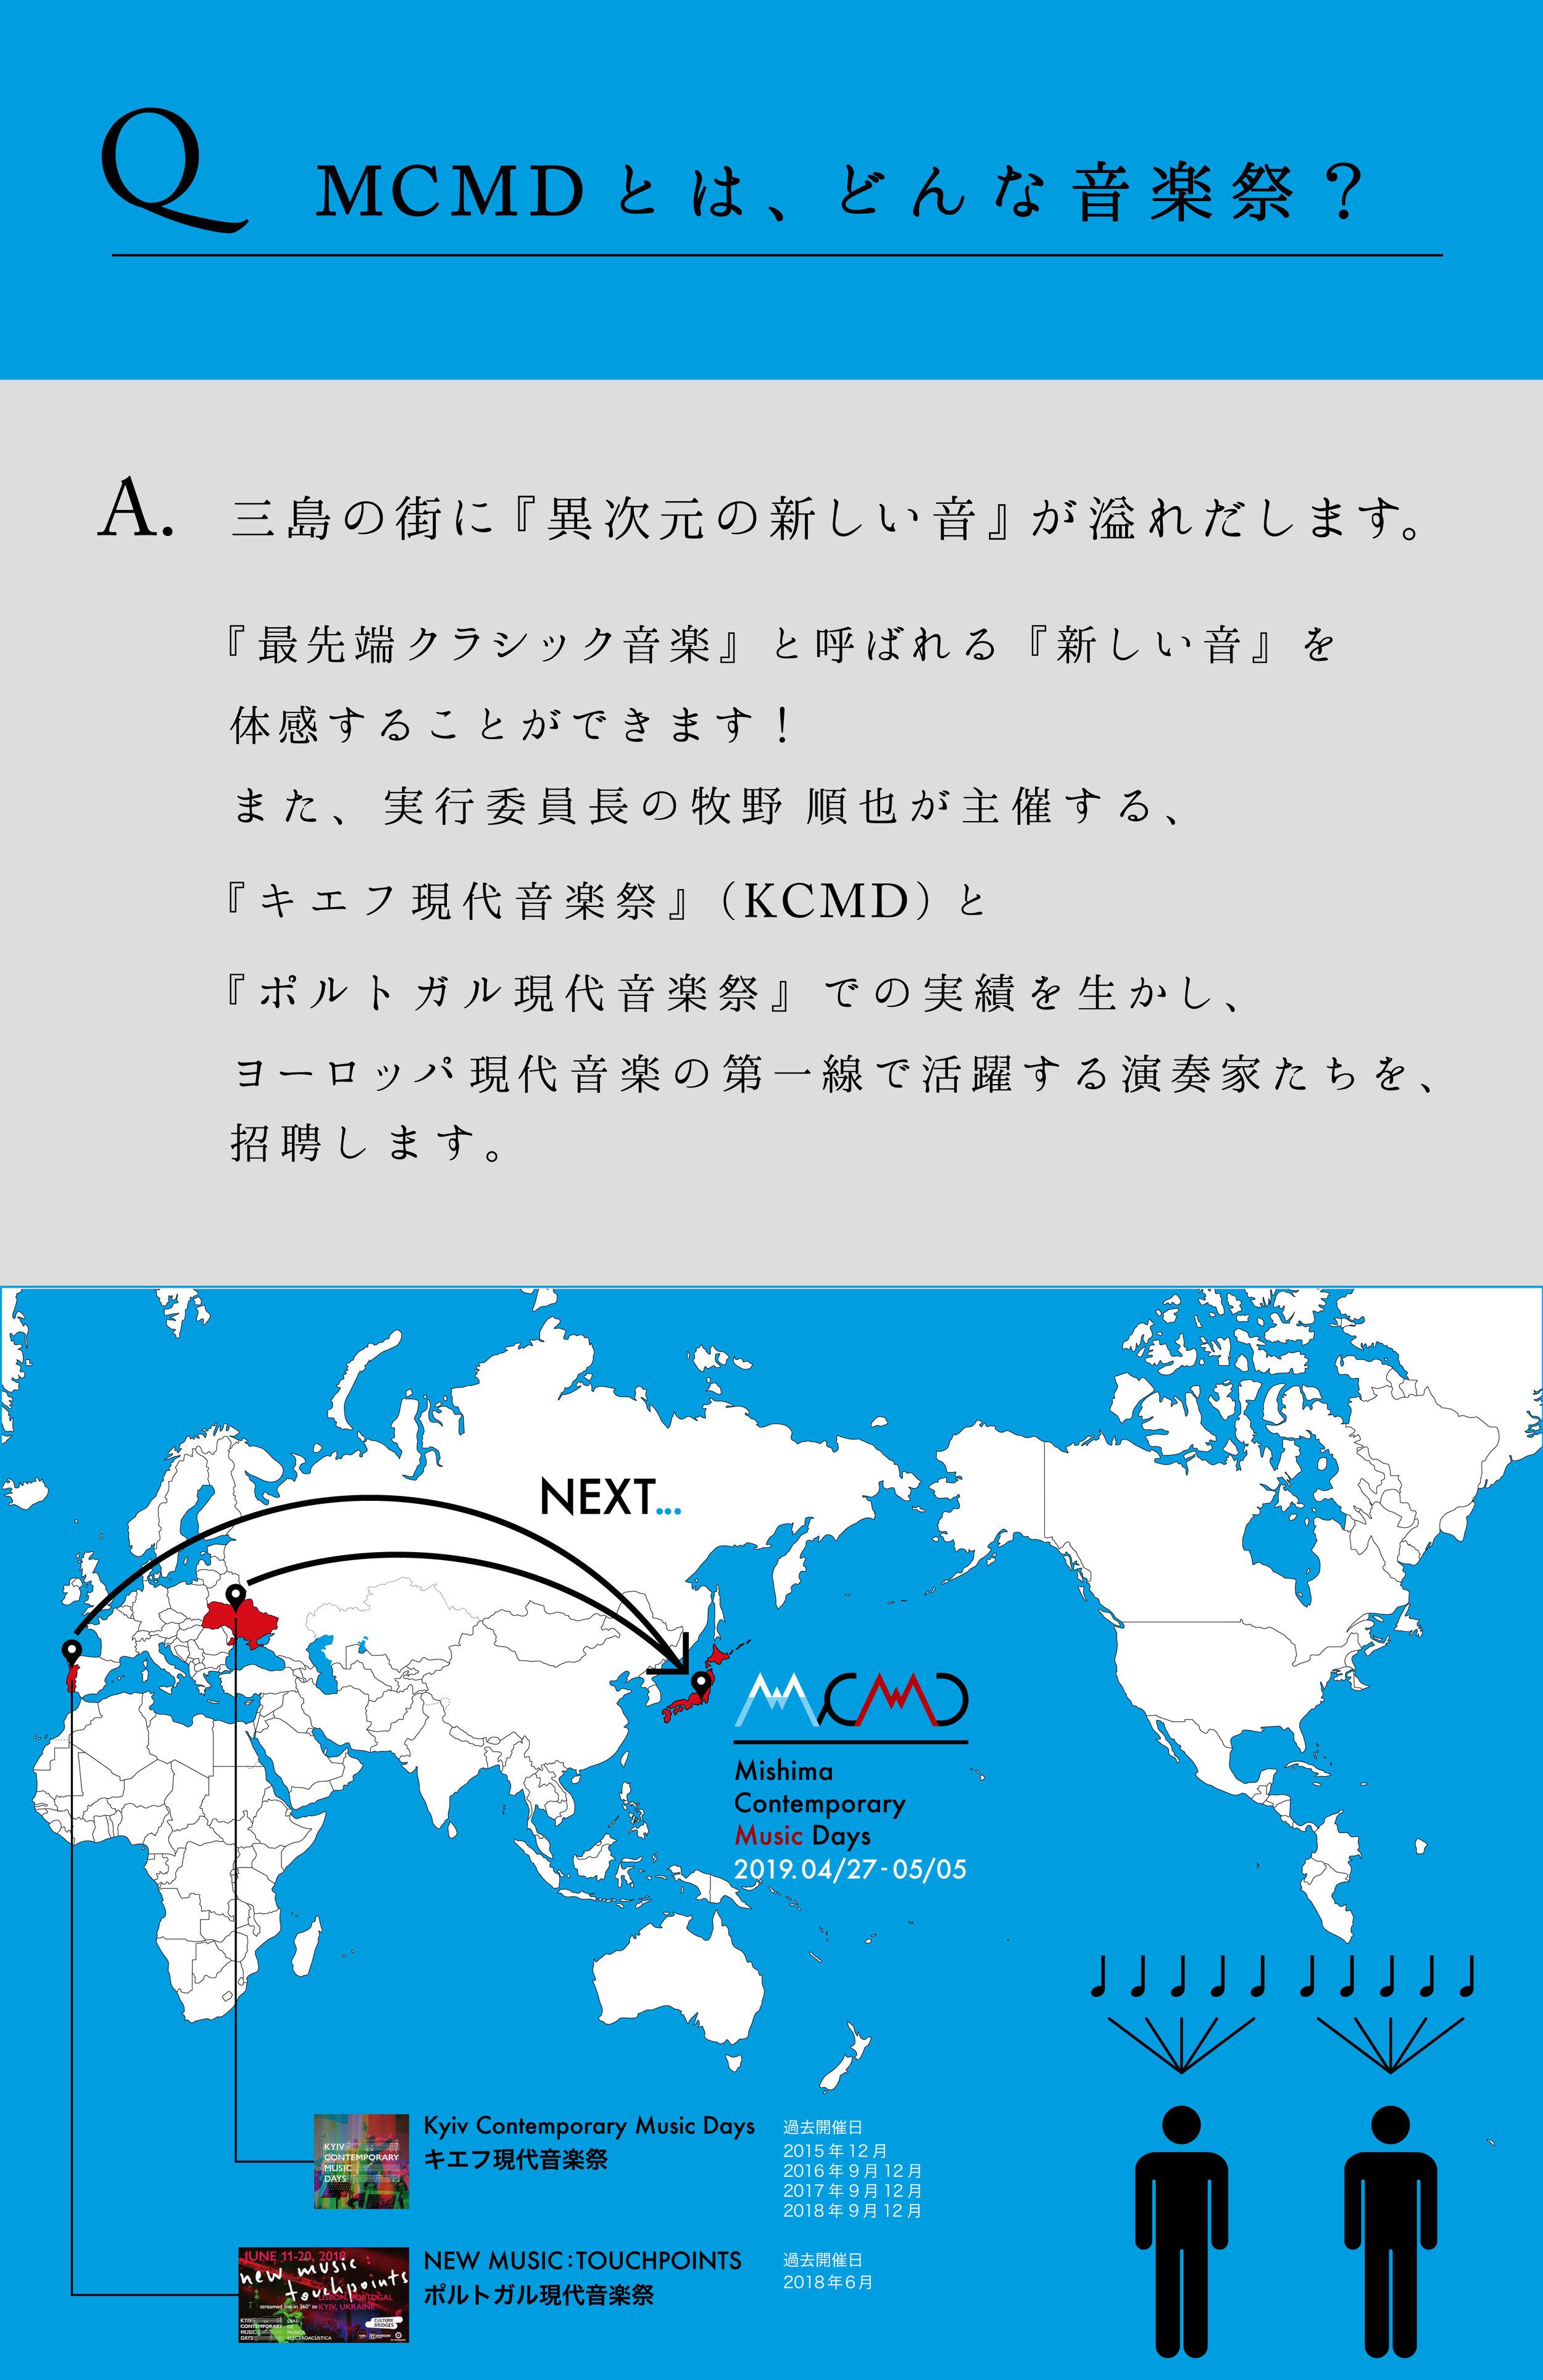 190125_MCMD_web-68.jpg